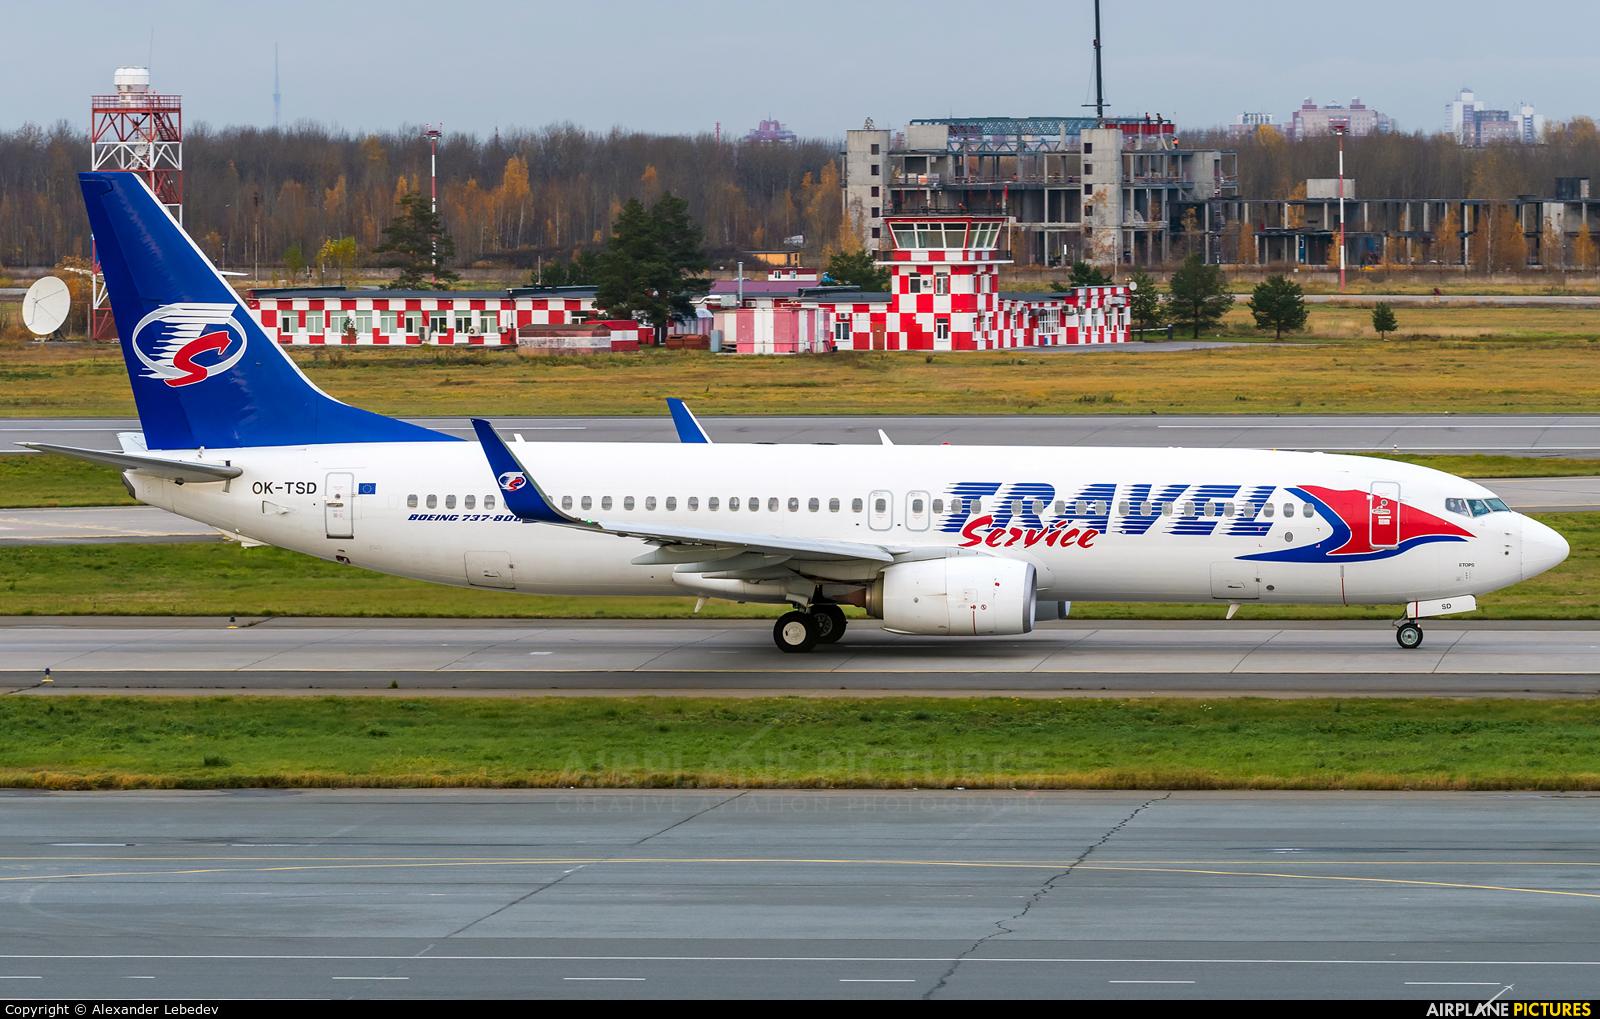 Travel Service OK-TSD aircraft at St. Petersburg - Pulkovo